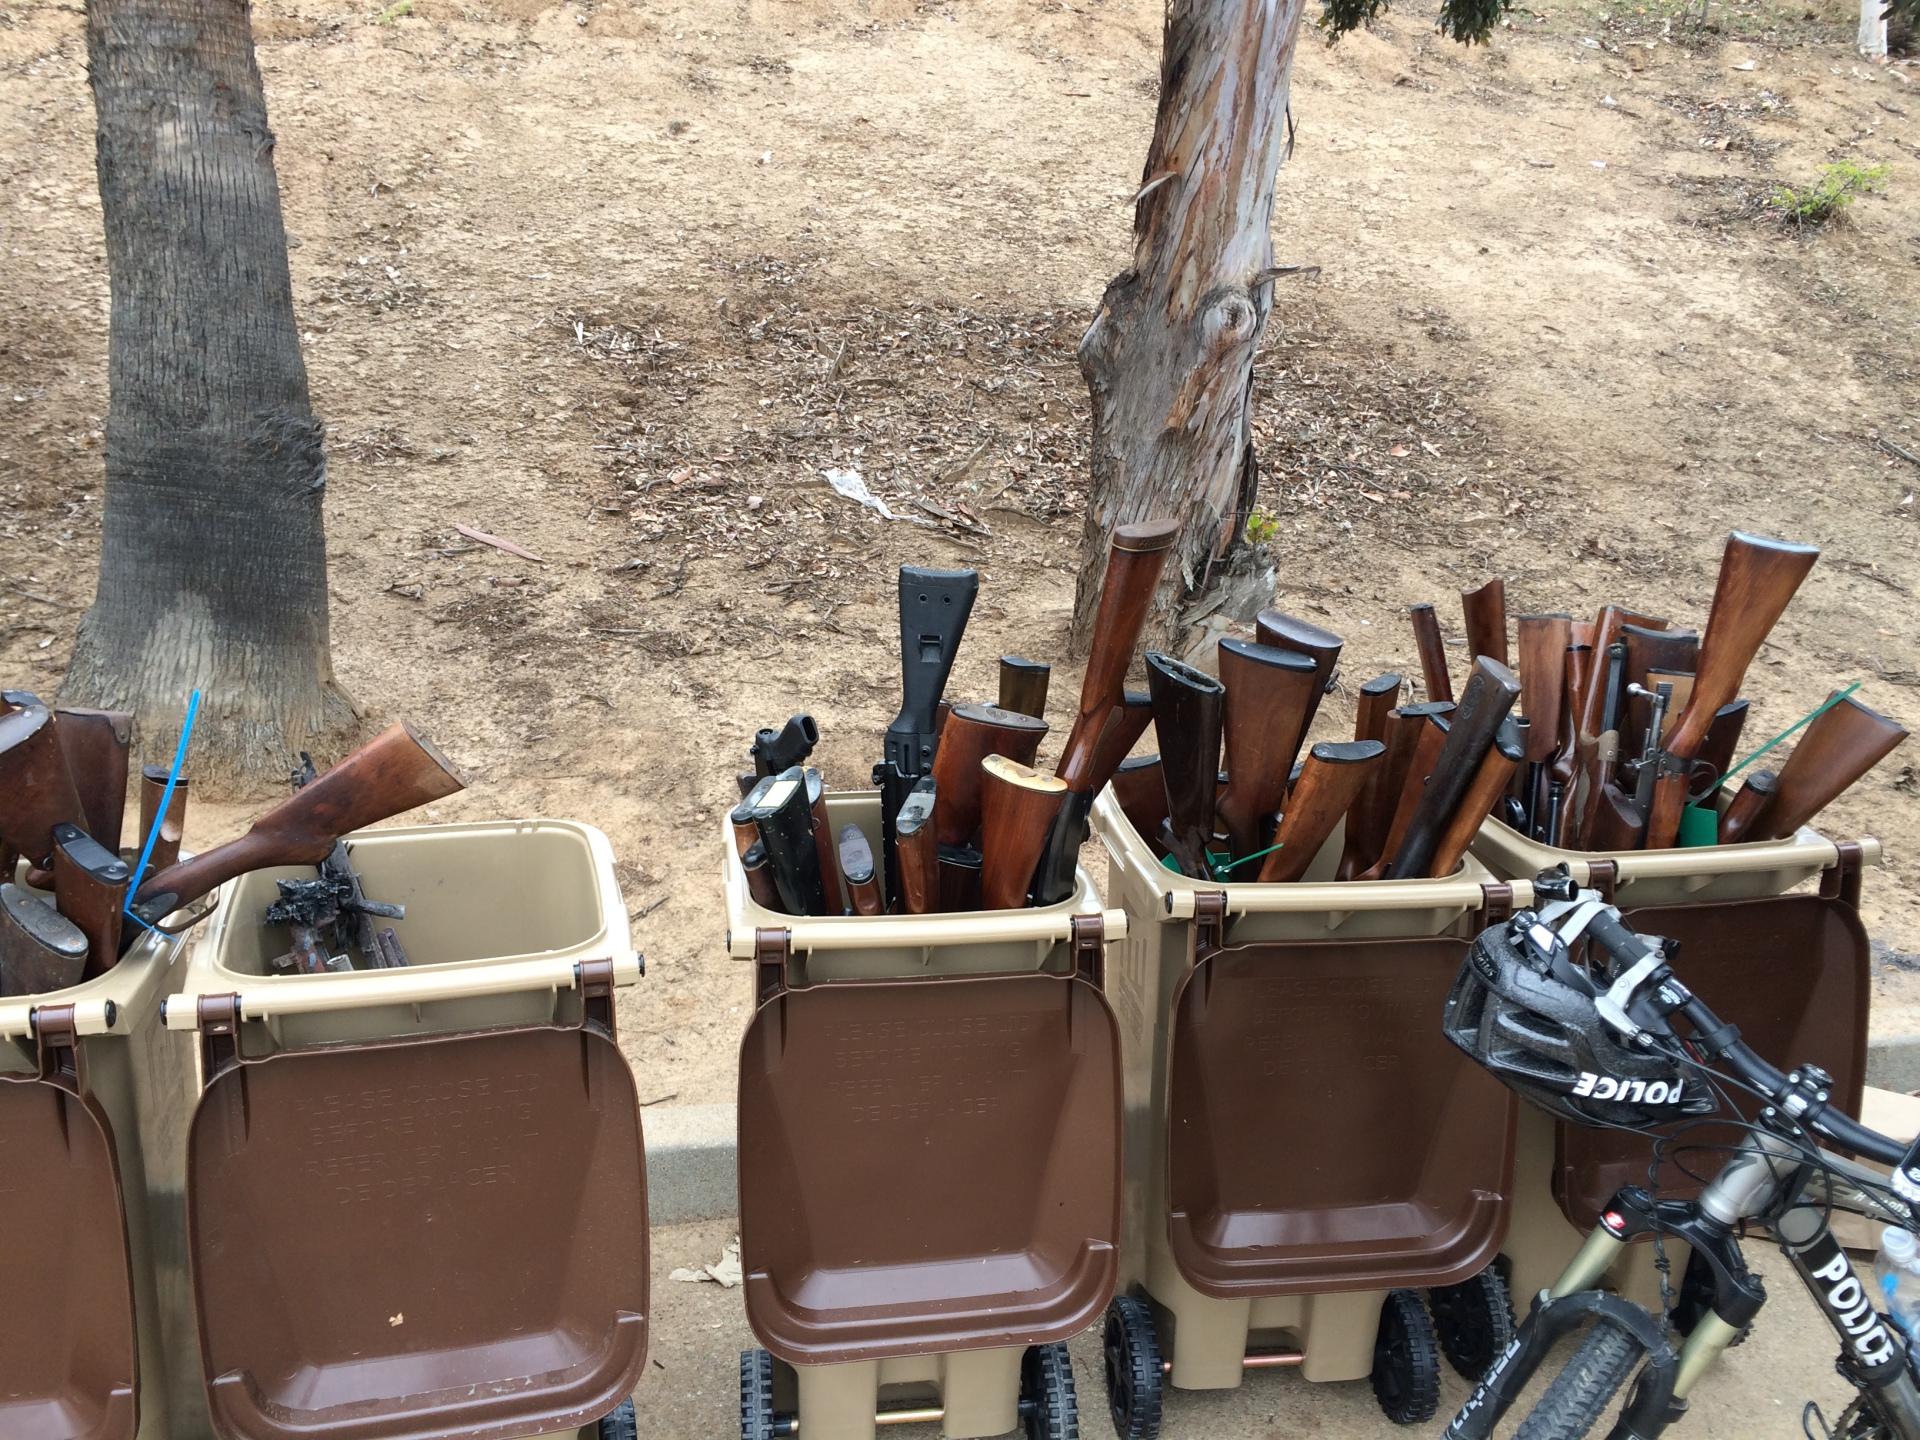 City of Santa Barbara Adopts New Gun Violence Prevention Legislative Measures